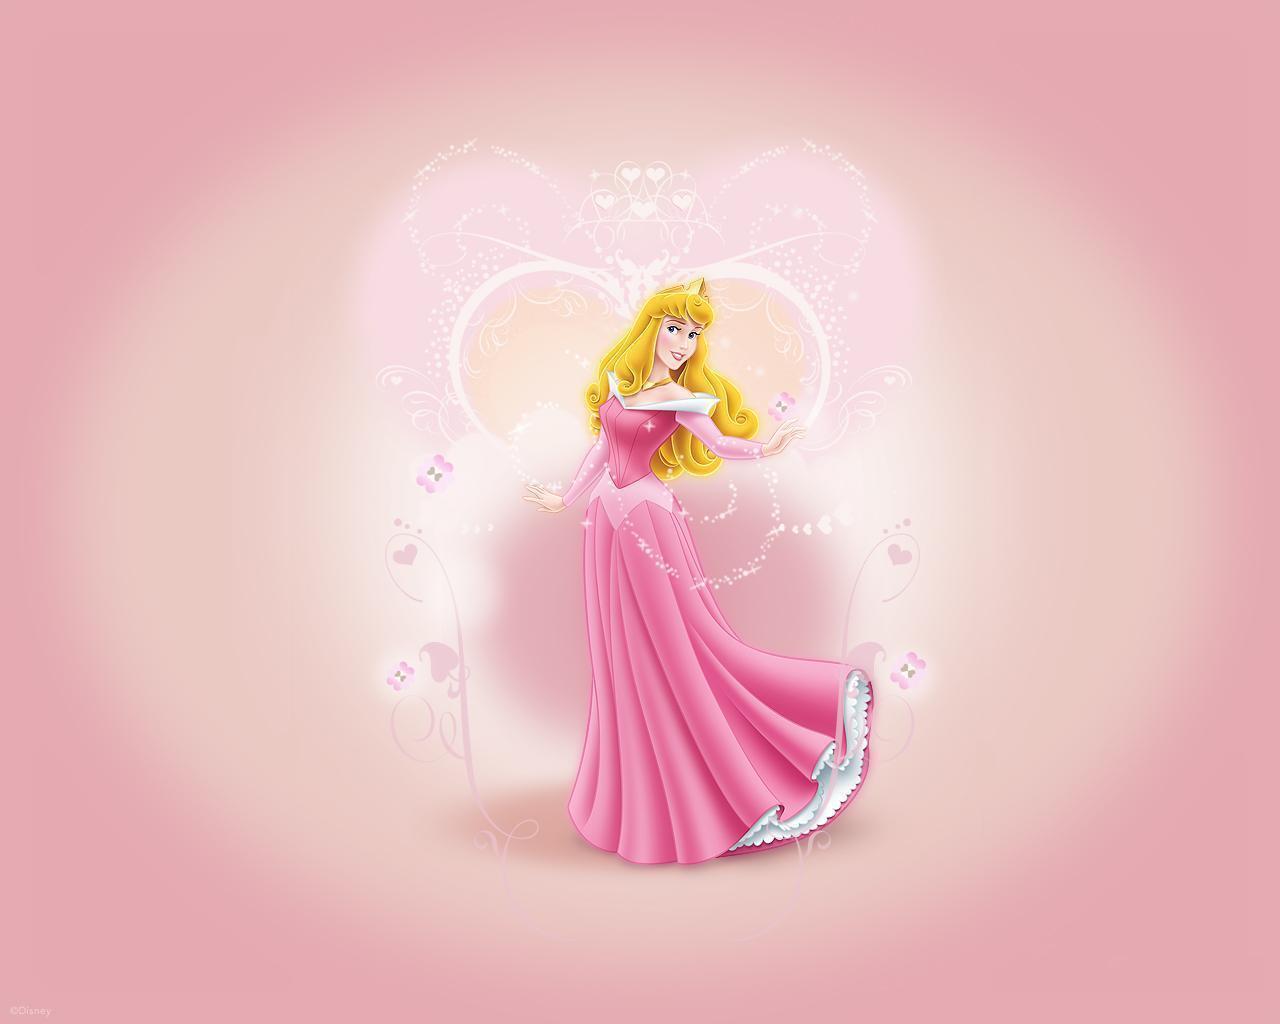 Beautiful Wallpapers Sleeping Beauty Wallpaper 1280x1024